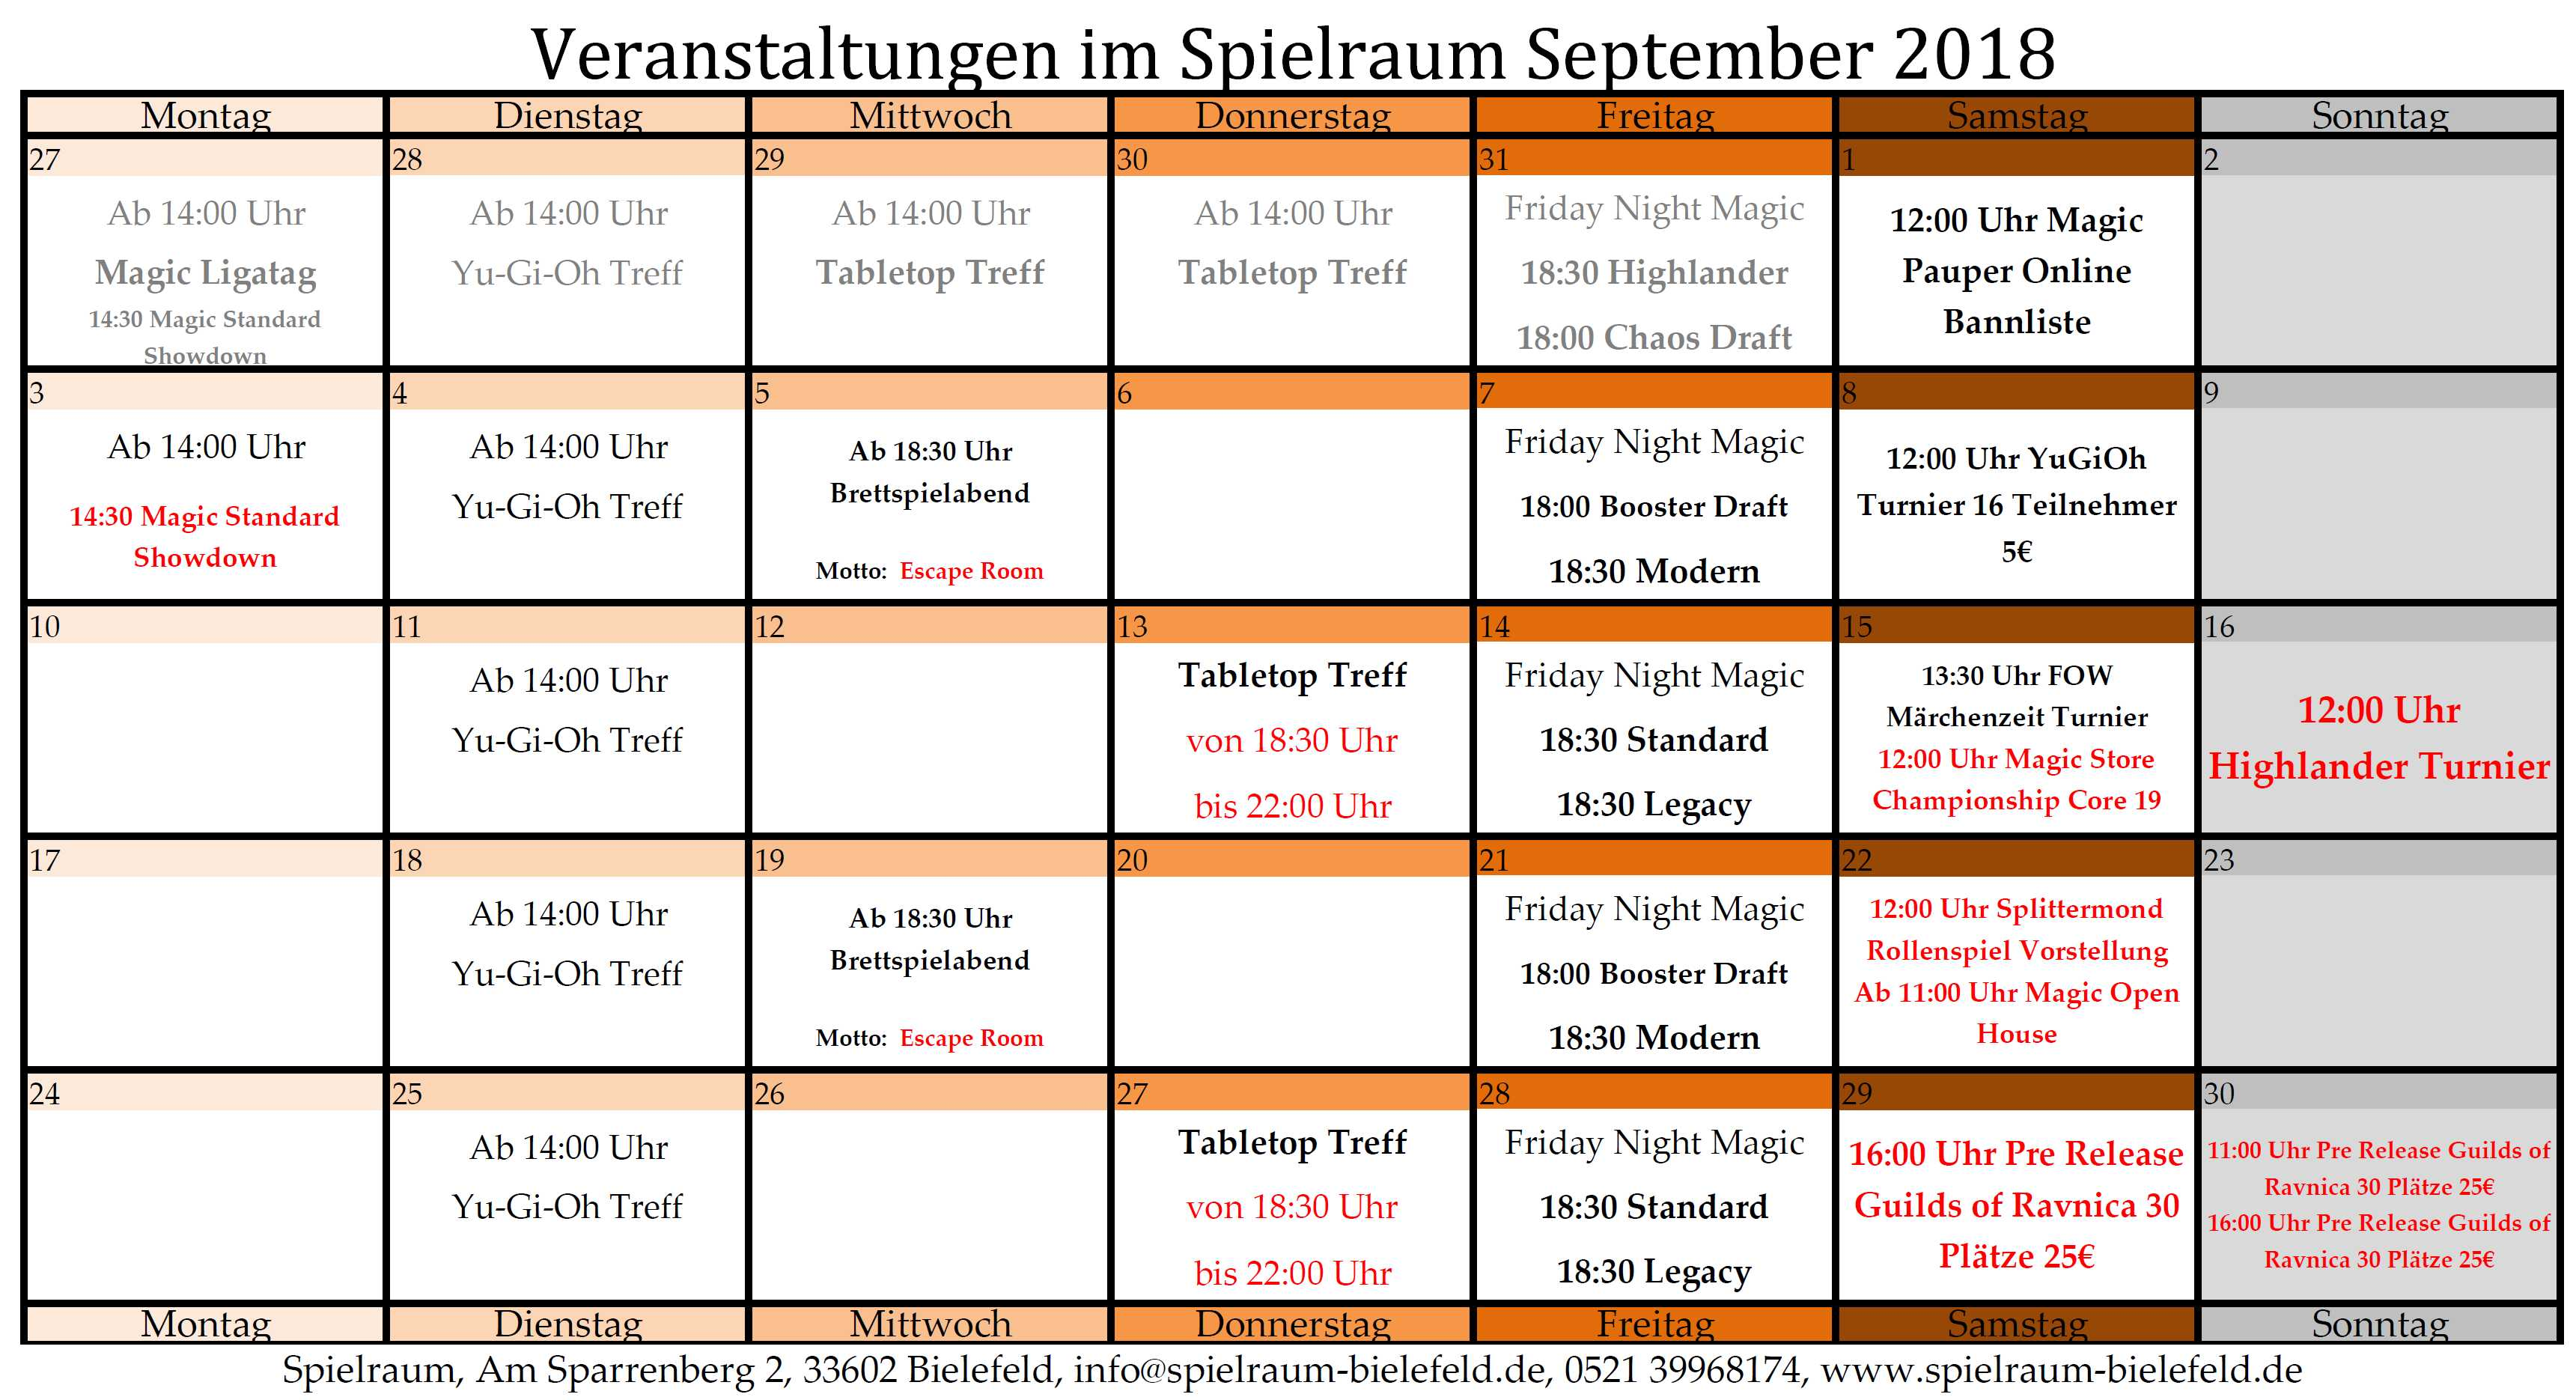 Monatsplan September 2018